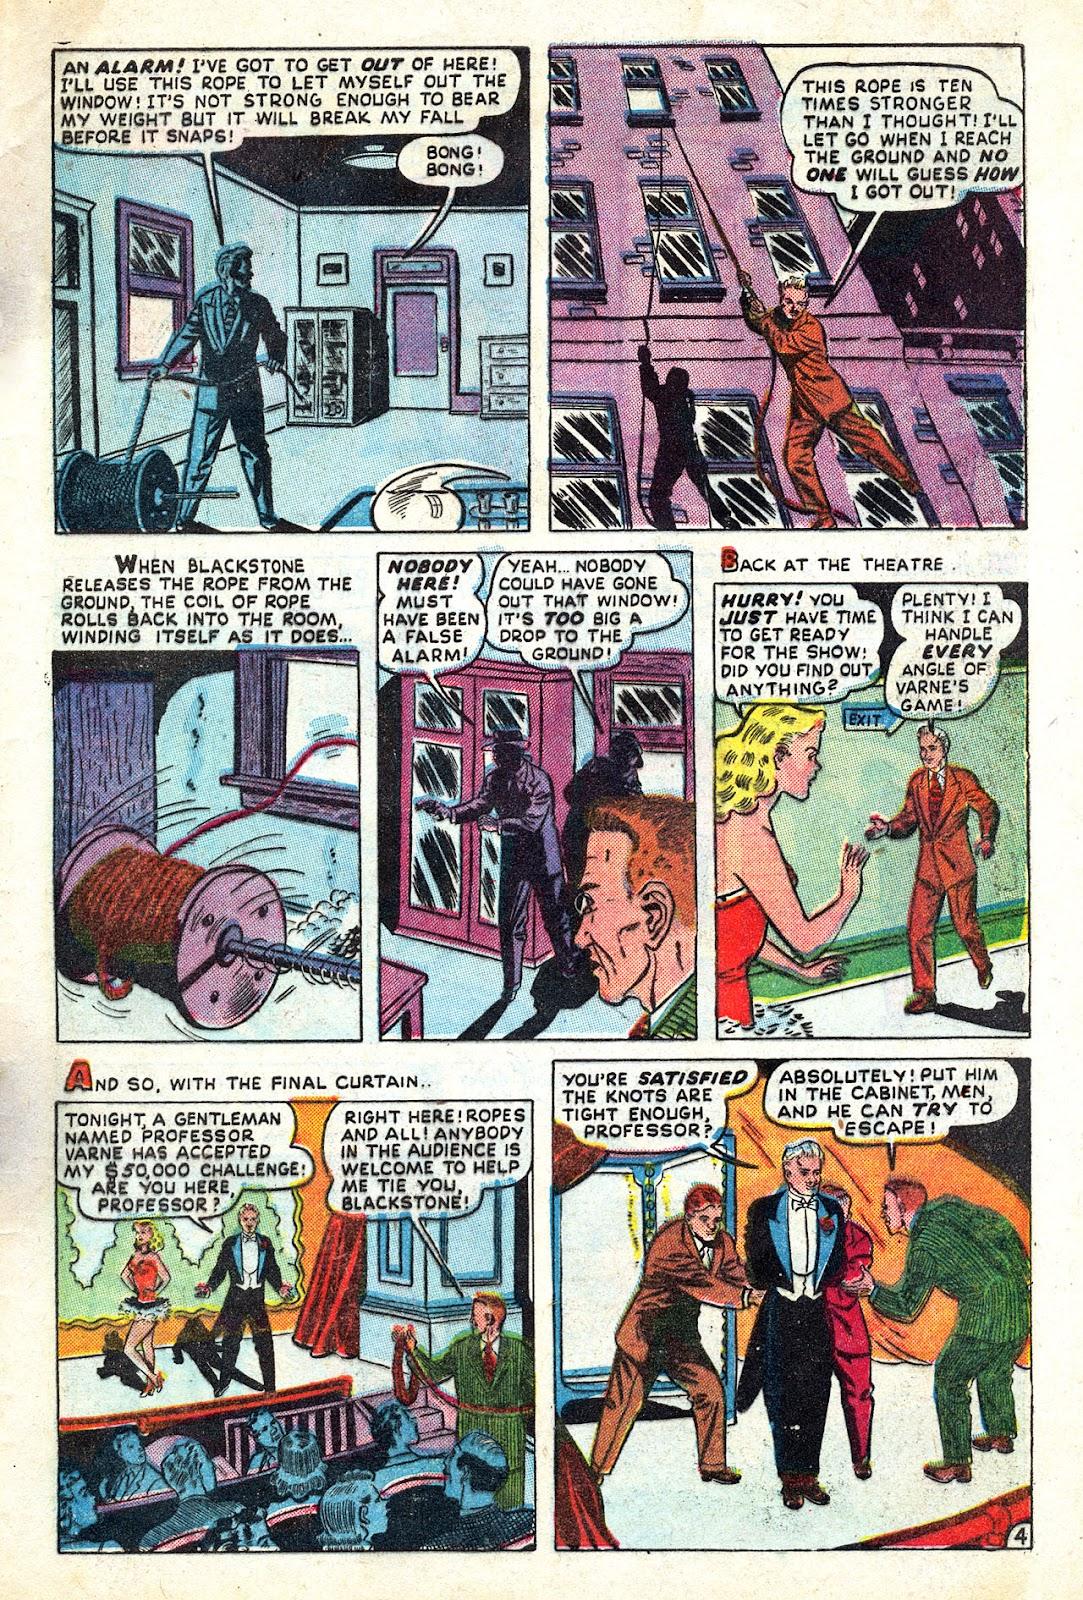 Read online Blackstone the Magician comic -  Issue #4 - 29